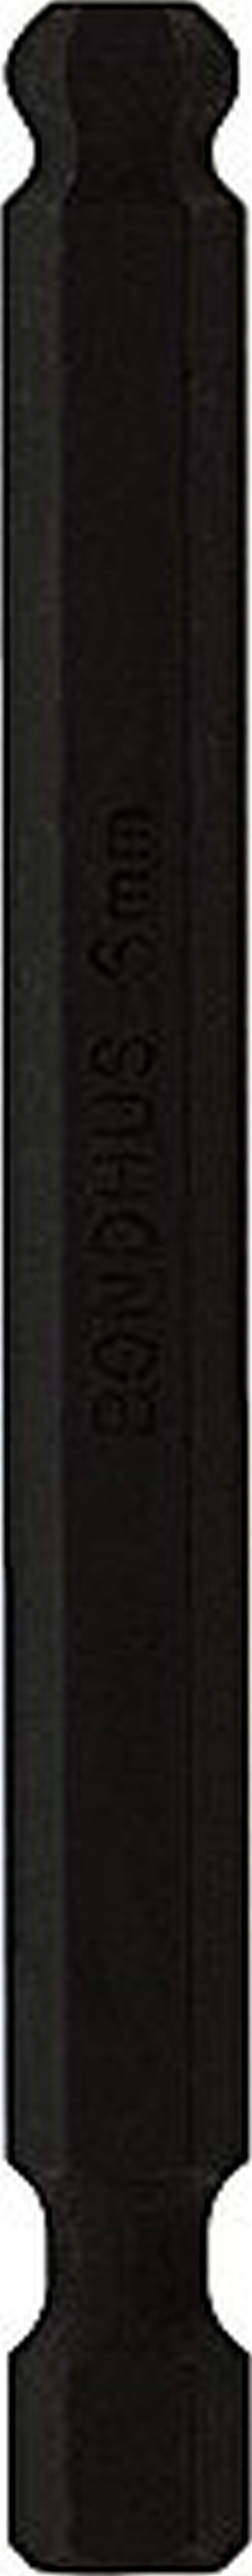 "5mm Hex Ball End Power Bit 3/""OAL 1//4/""Quick Change Hex Shank Bondhus USA #10864"